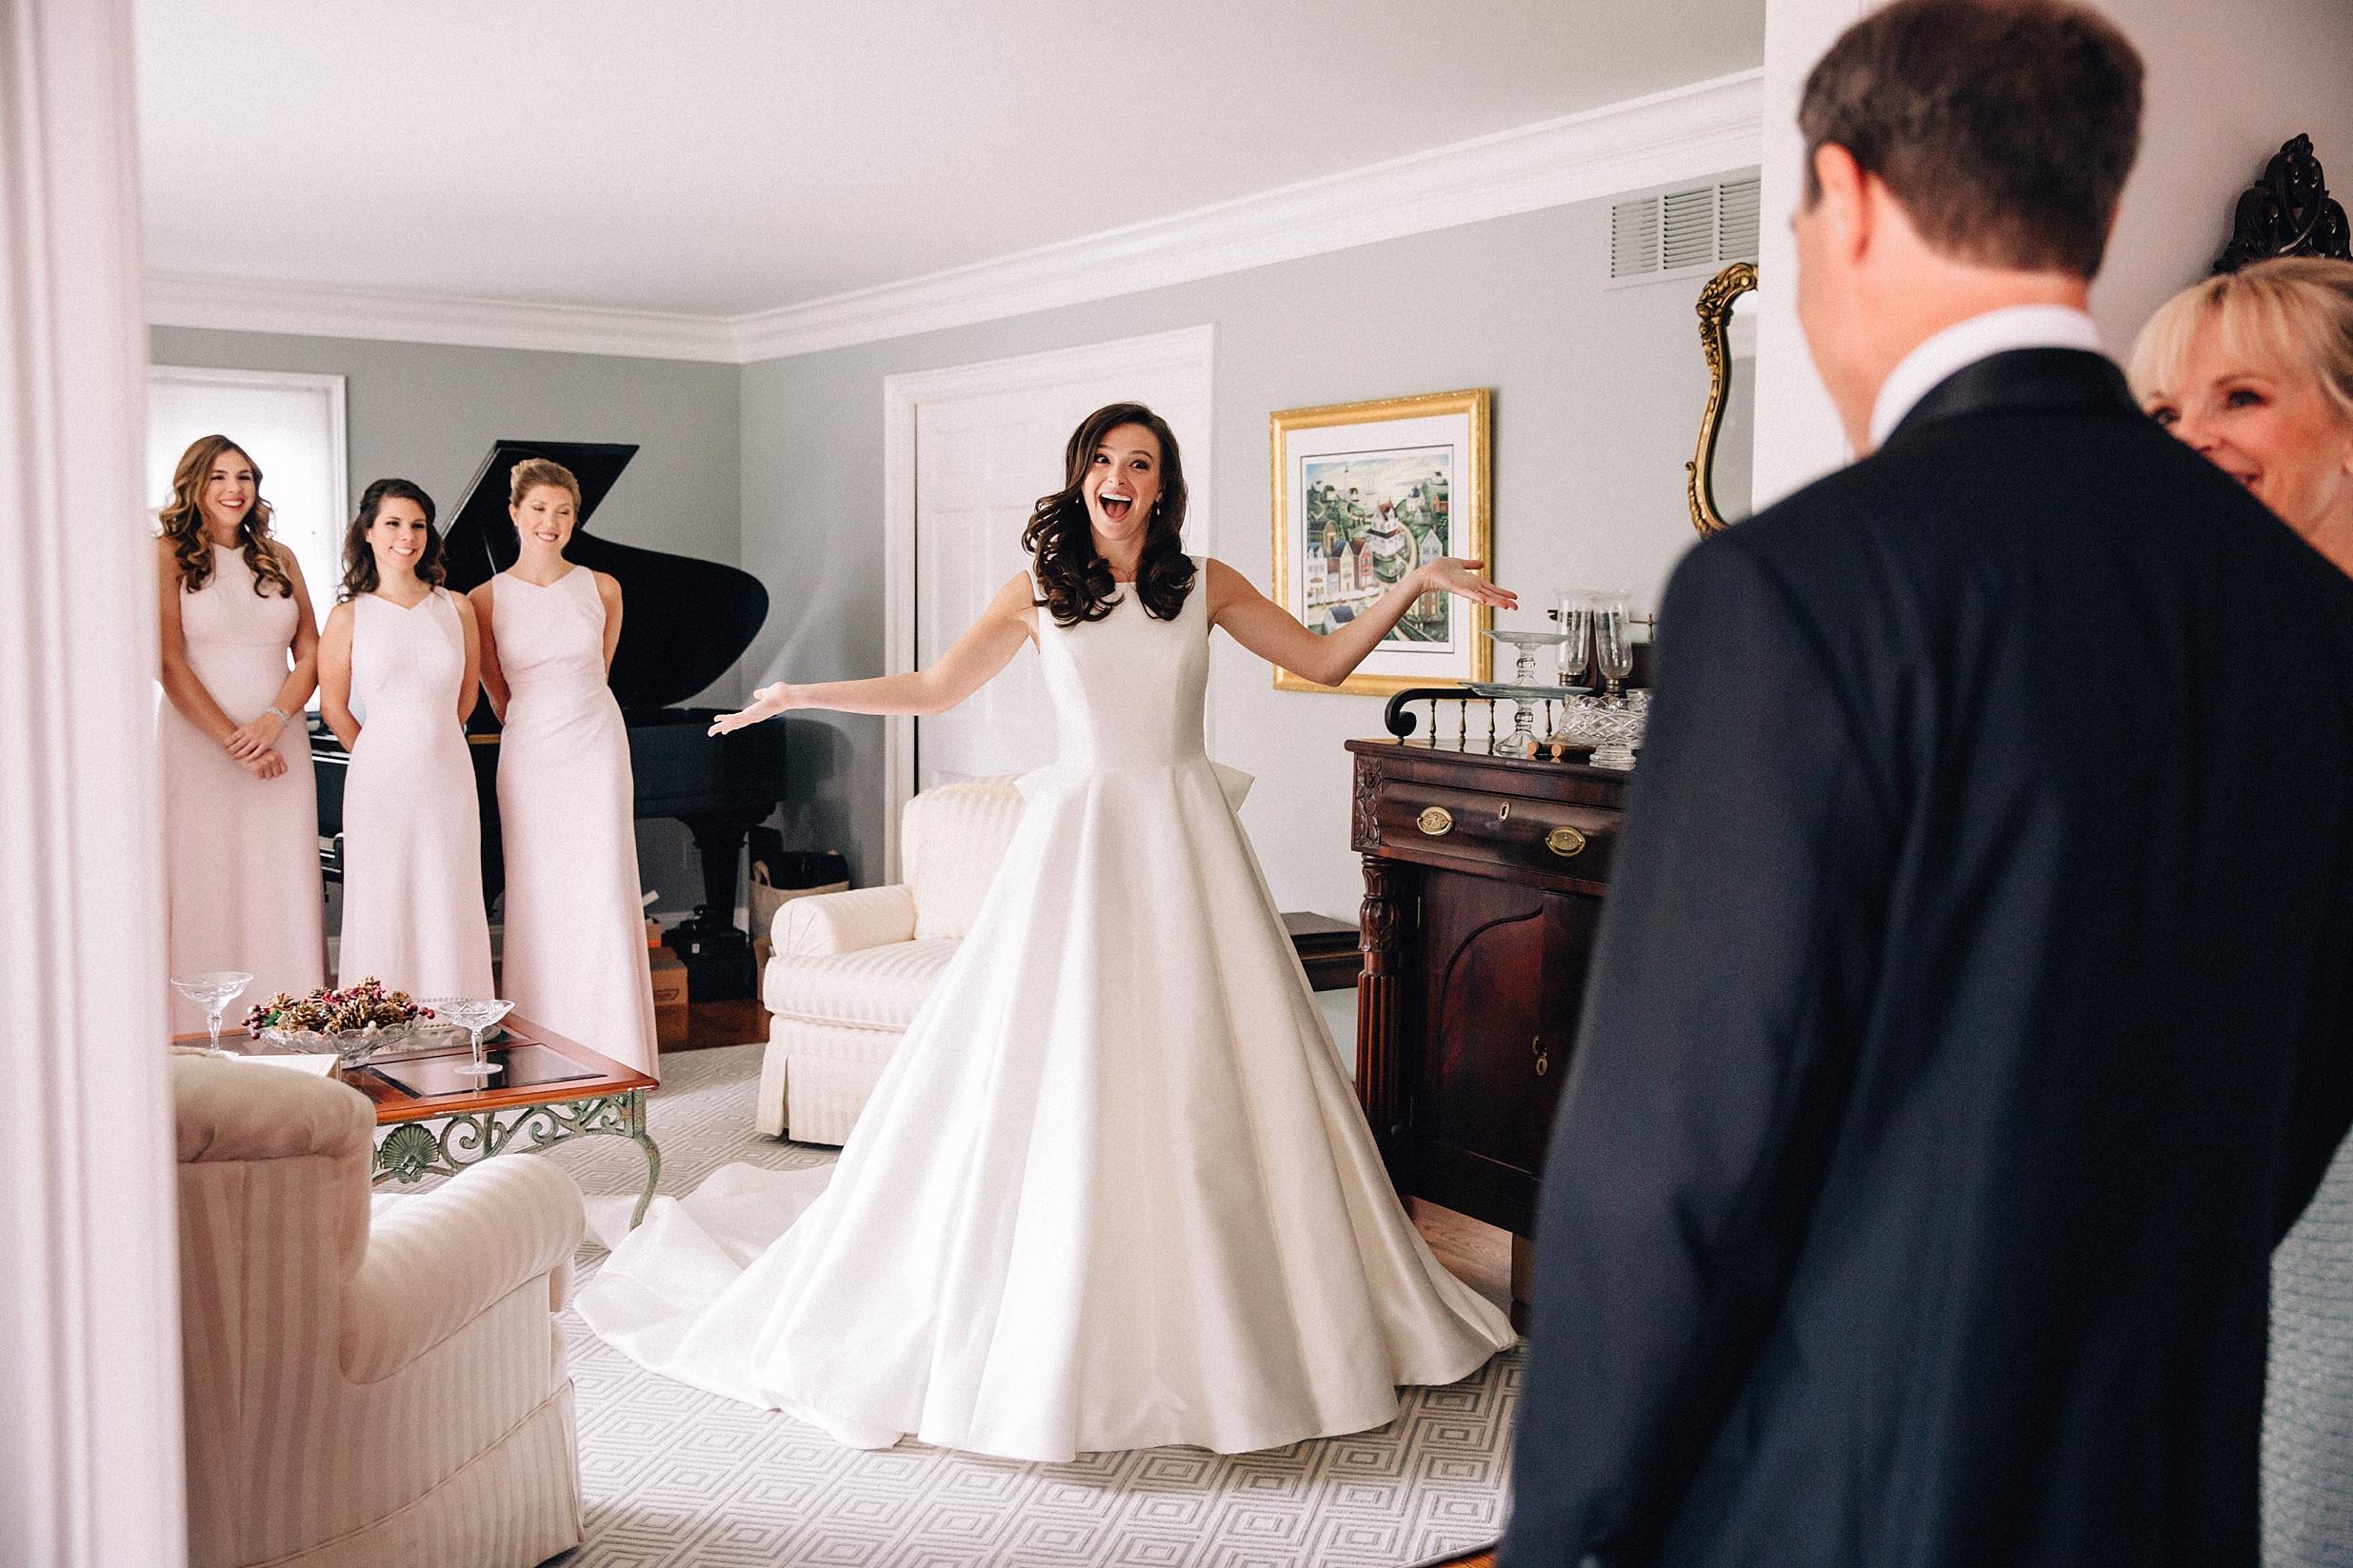 rumson-tented-wedding-nj-maine-conneticut-classic_0012.jpg